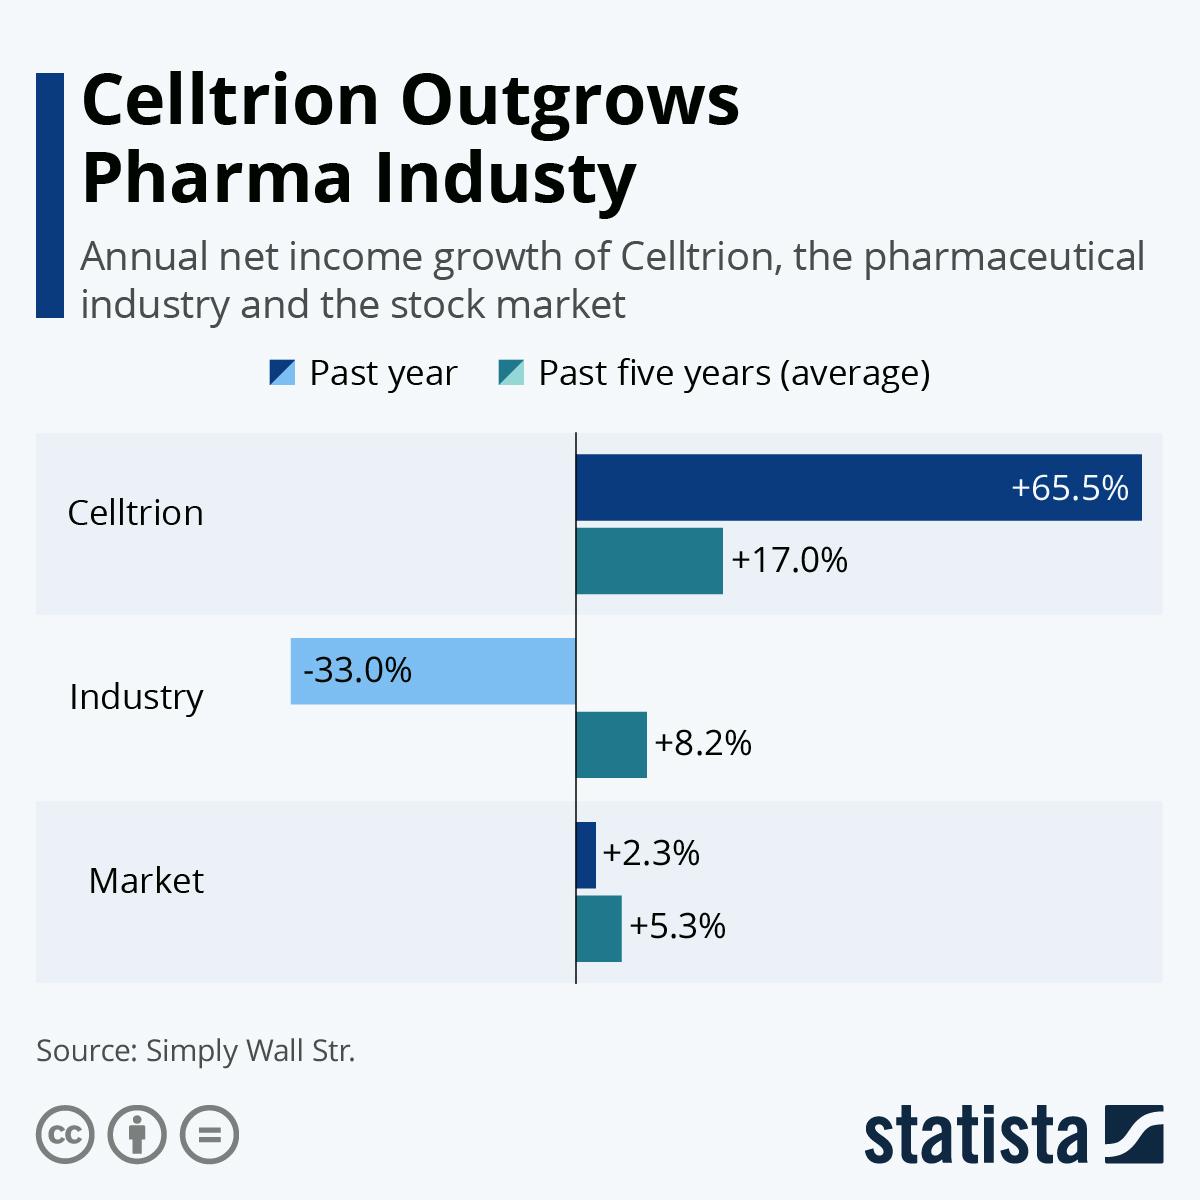 Celltrion Outgrows Pharma Industry https://t.co/6J1NwNOPIn #tech #digital #data #business https://t.co/XZtHMaNcTa